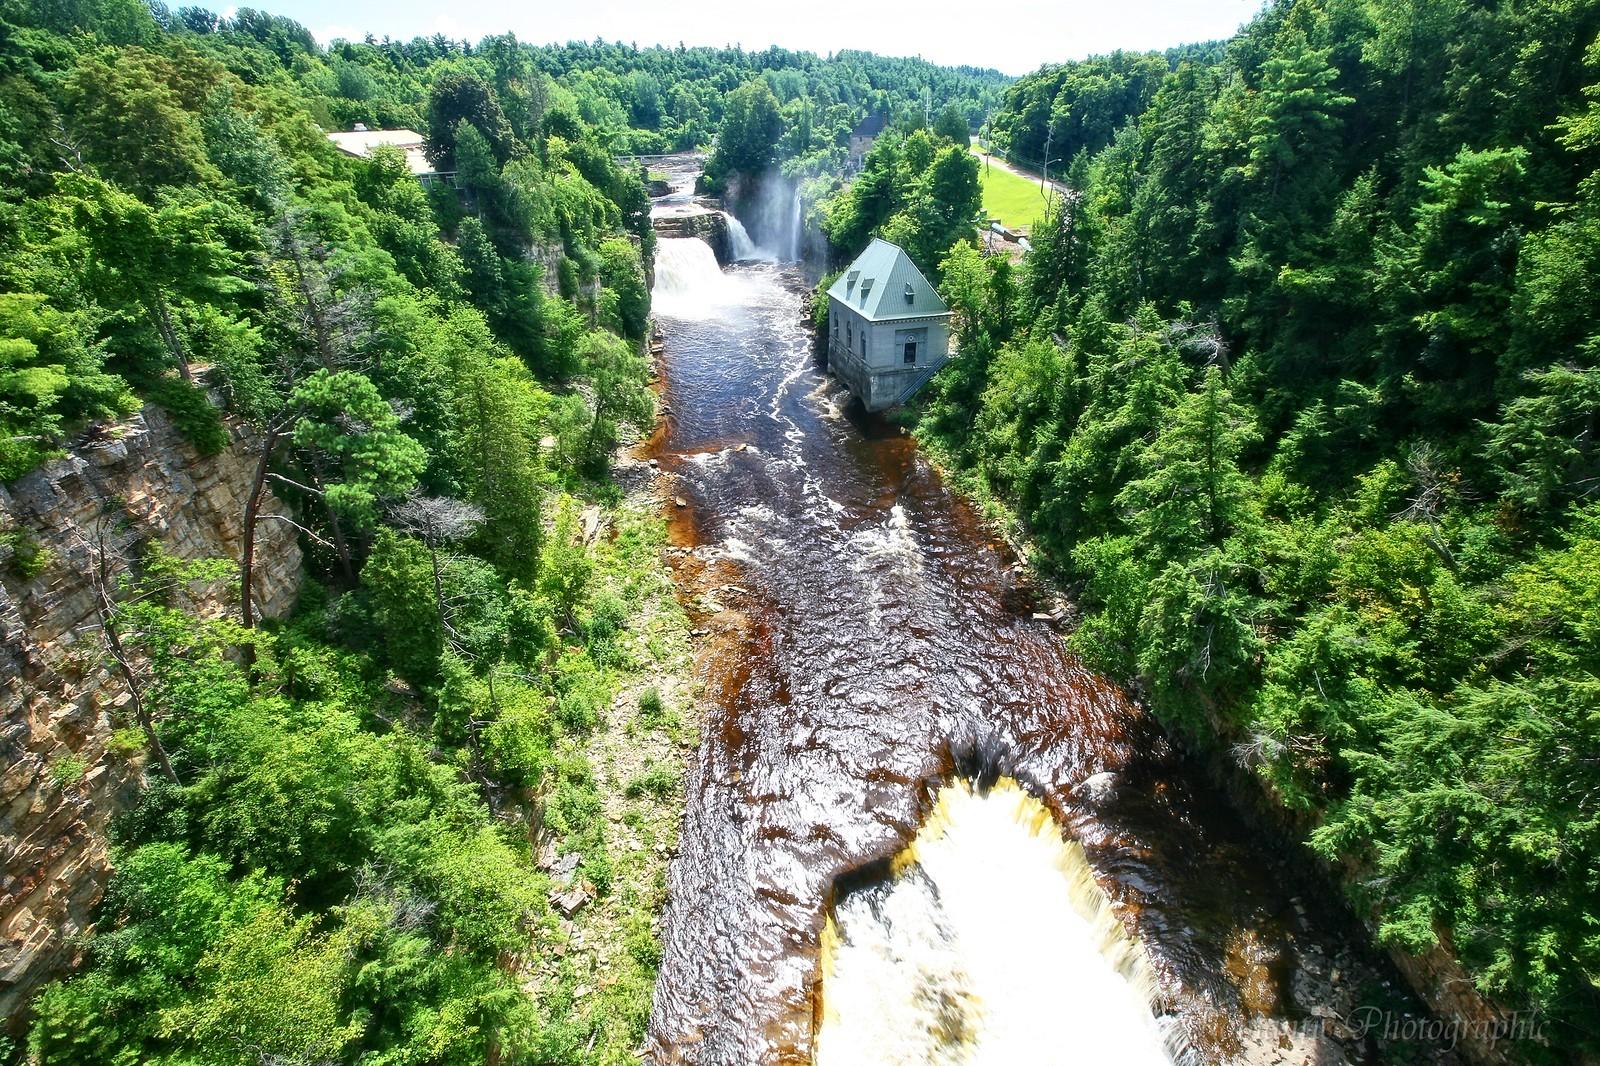 Tannin rich river in upstate New York [1600 x 1068] [OC]